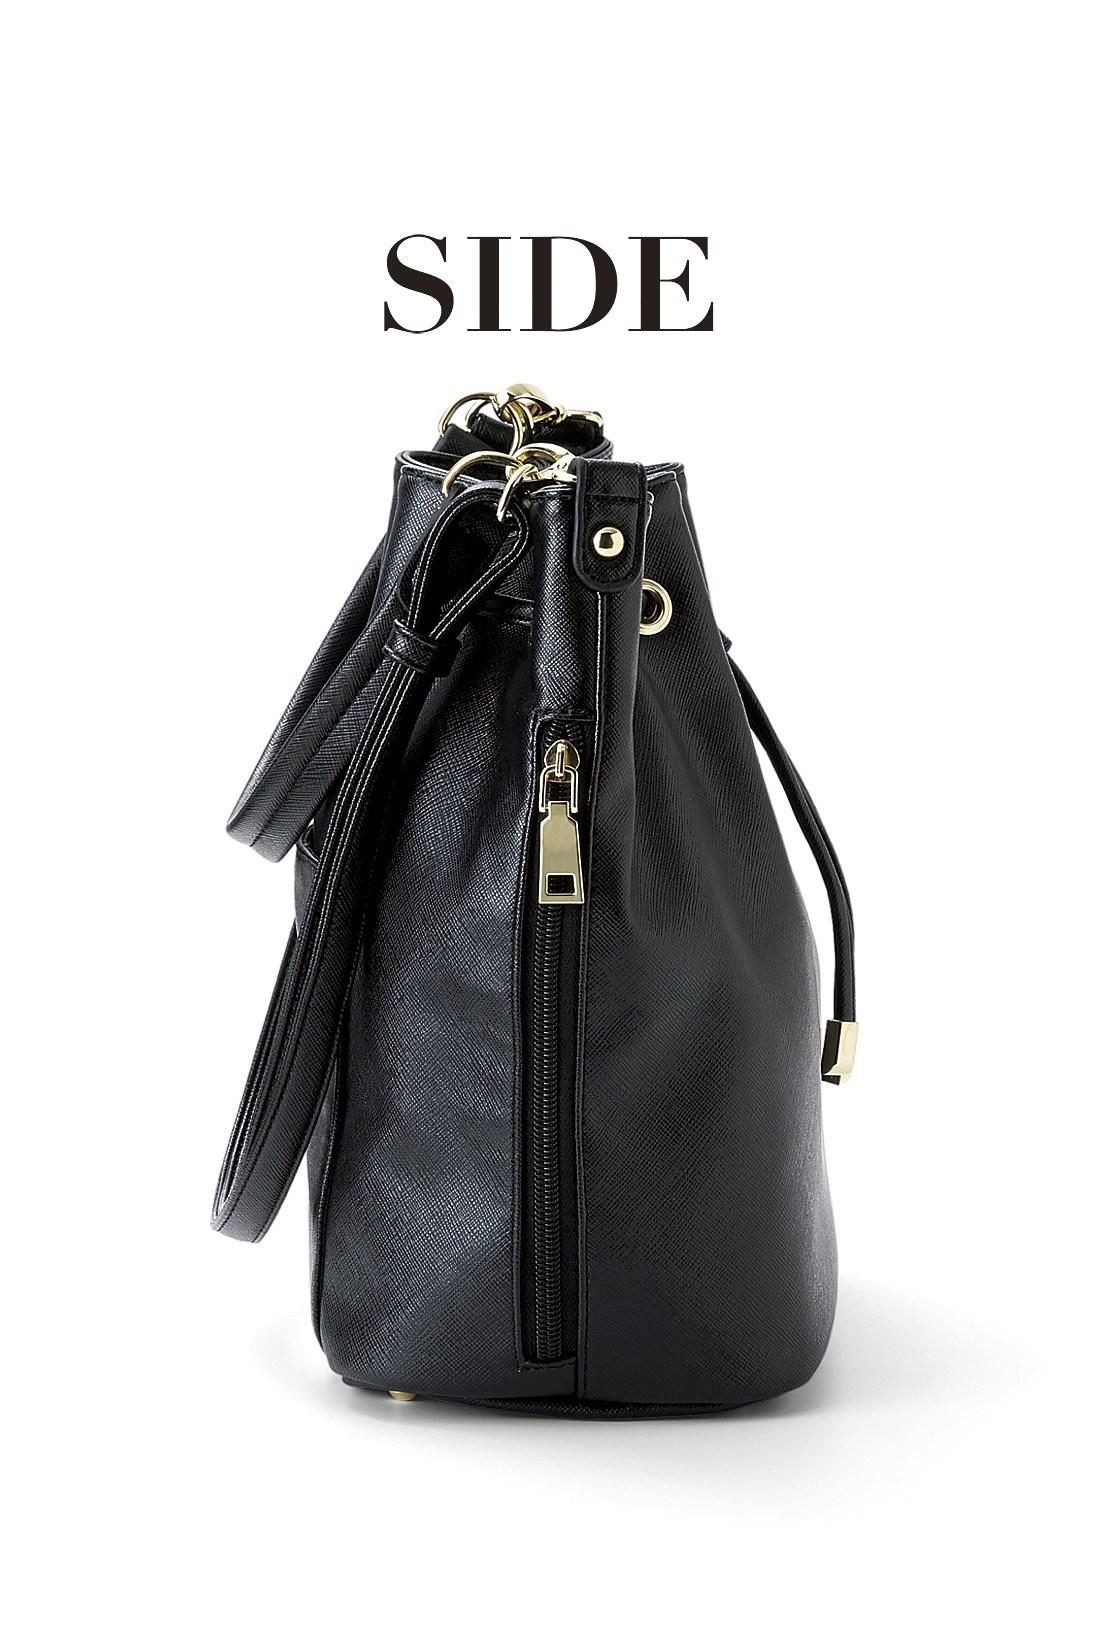 SIDE 財布などを取り出しやすい、ファスナーのサイドポケット。